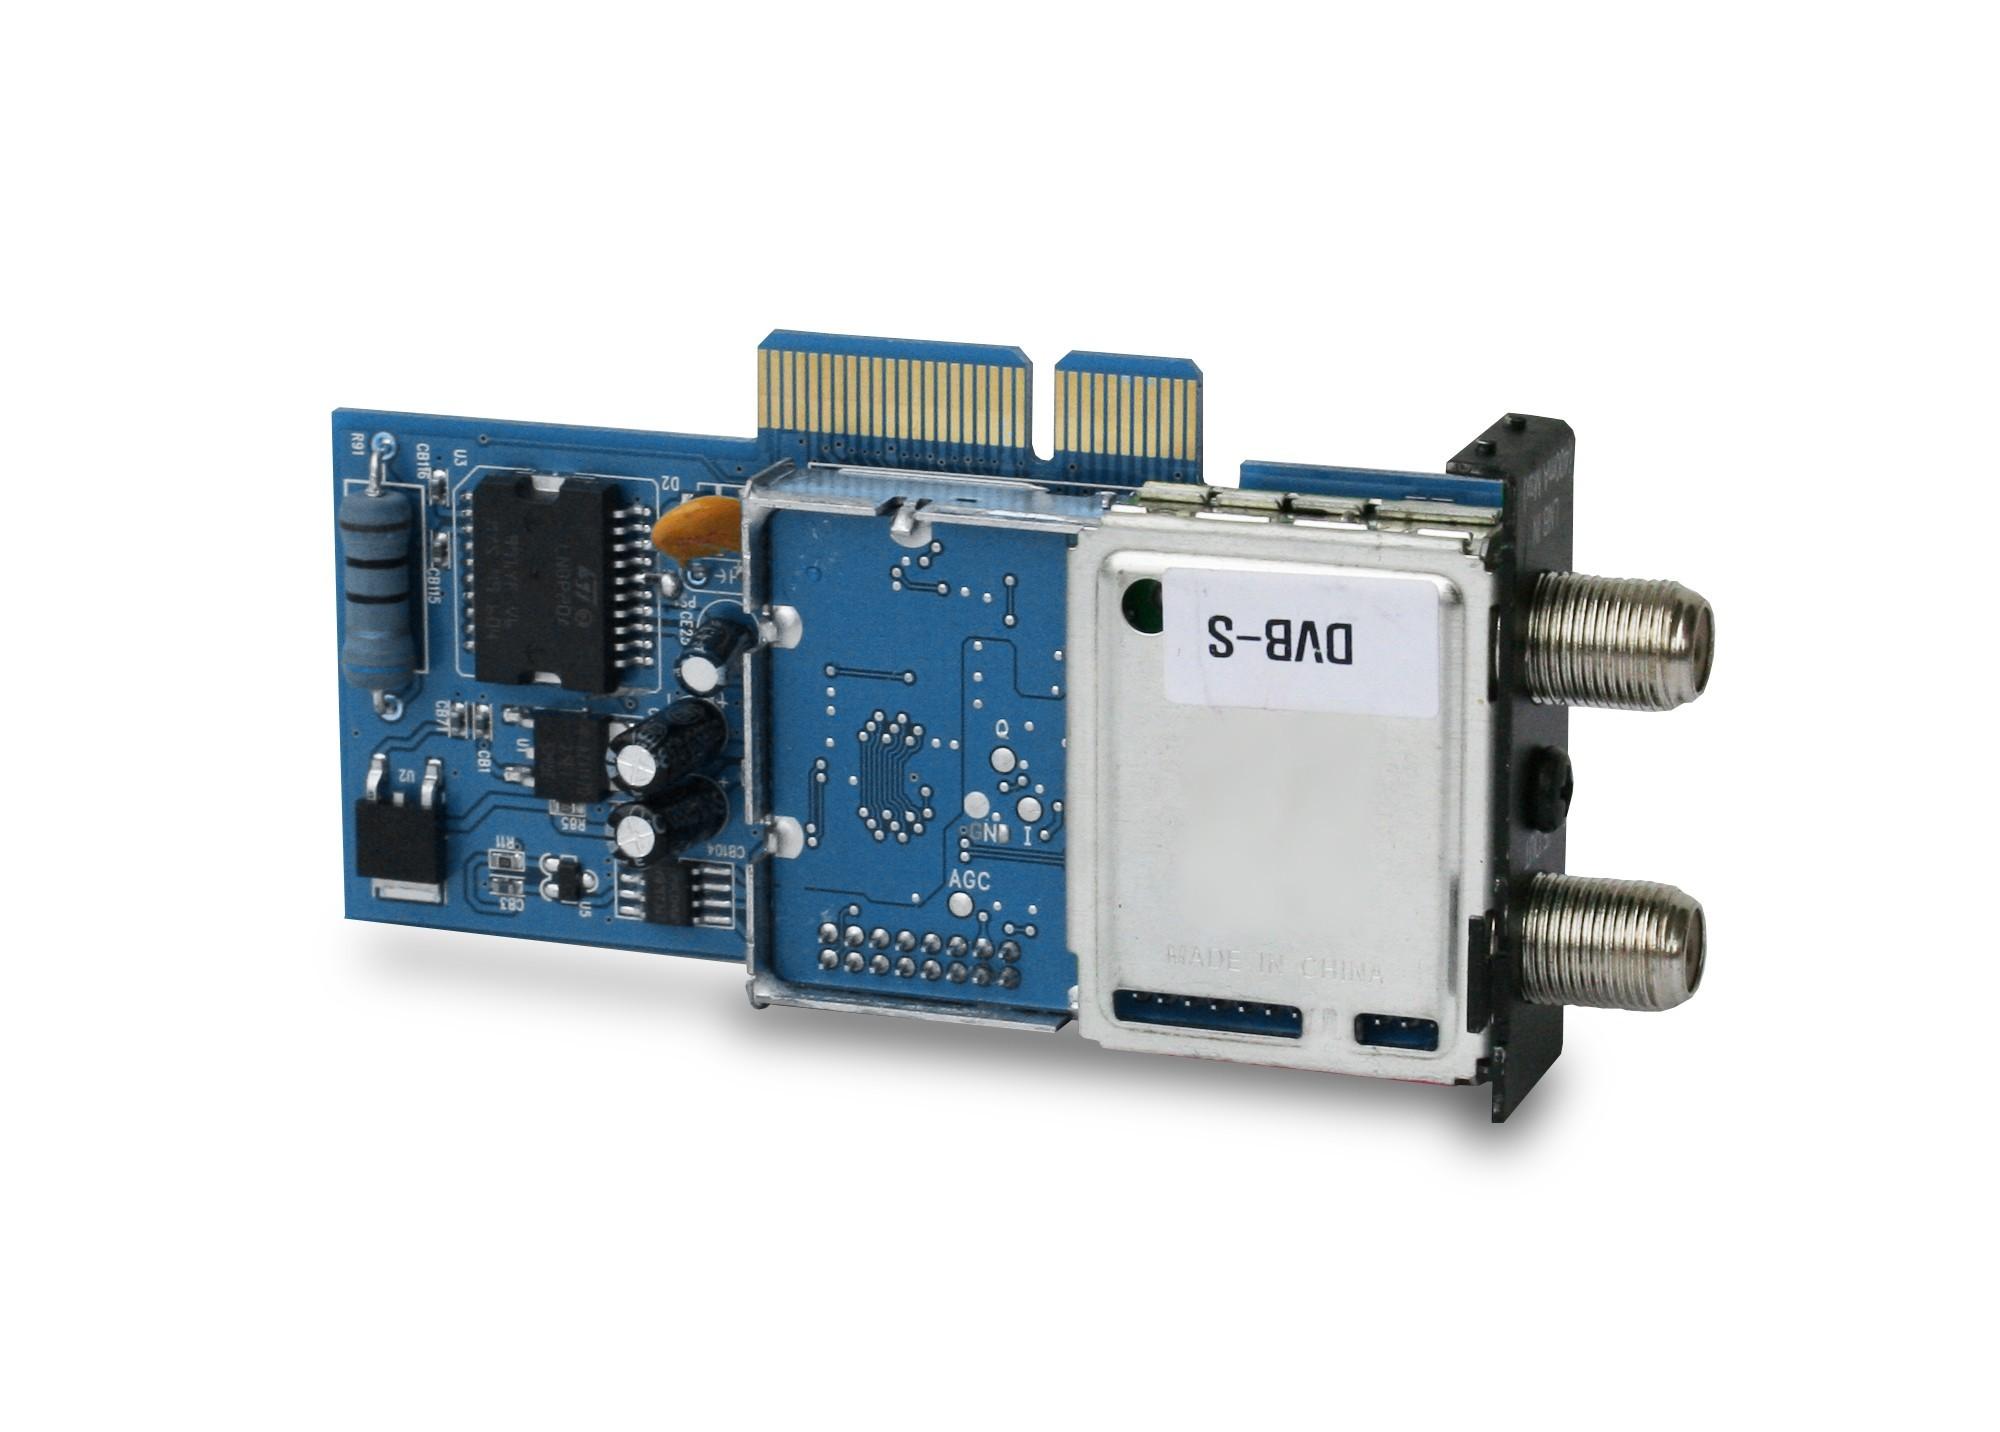 DVB - S tuner pre AB IPBox 9000HD